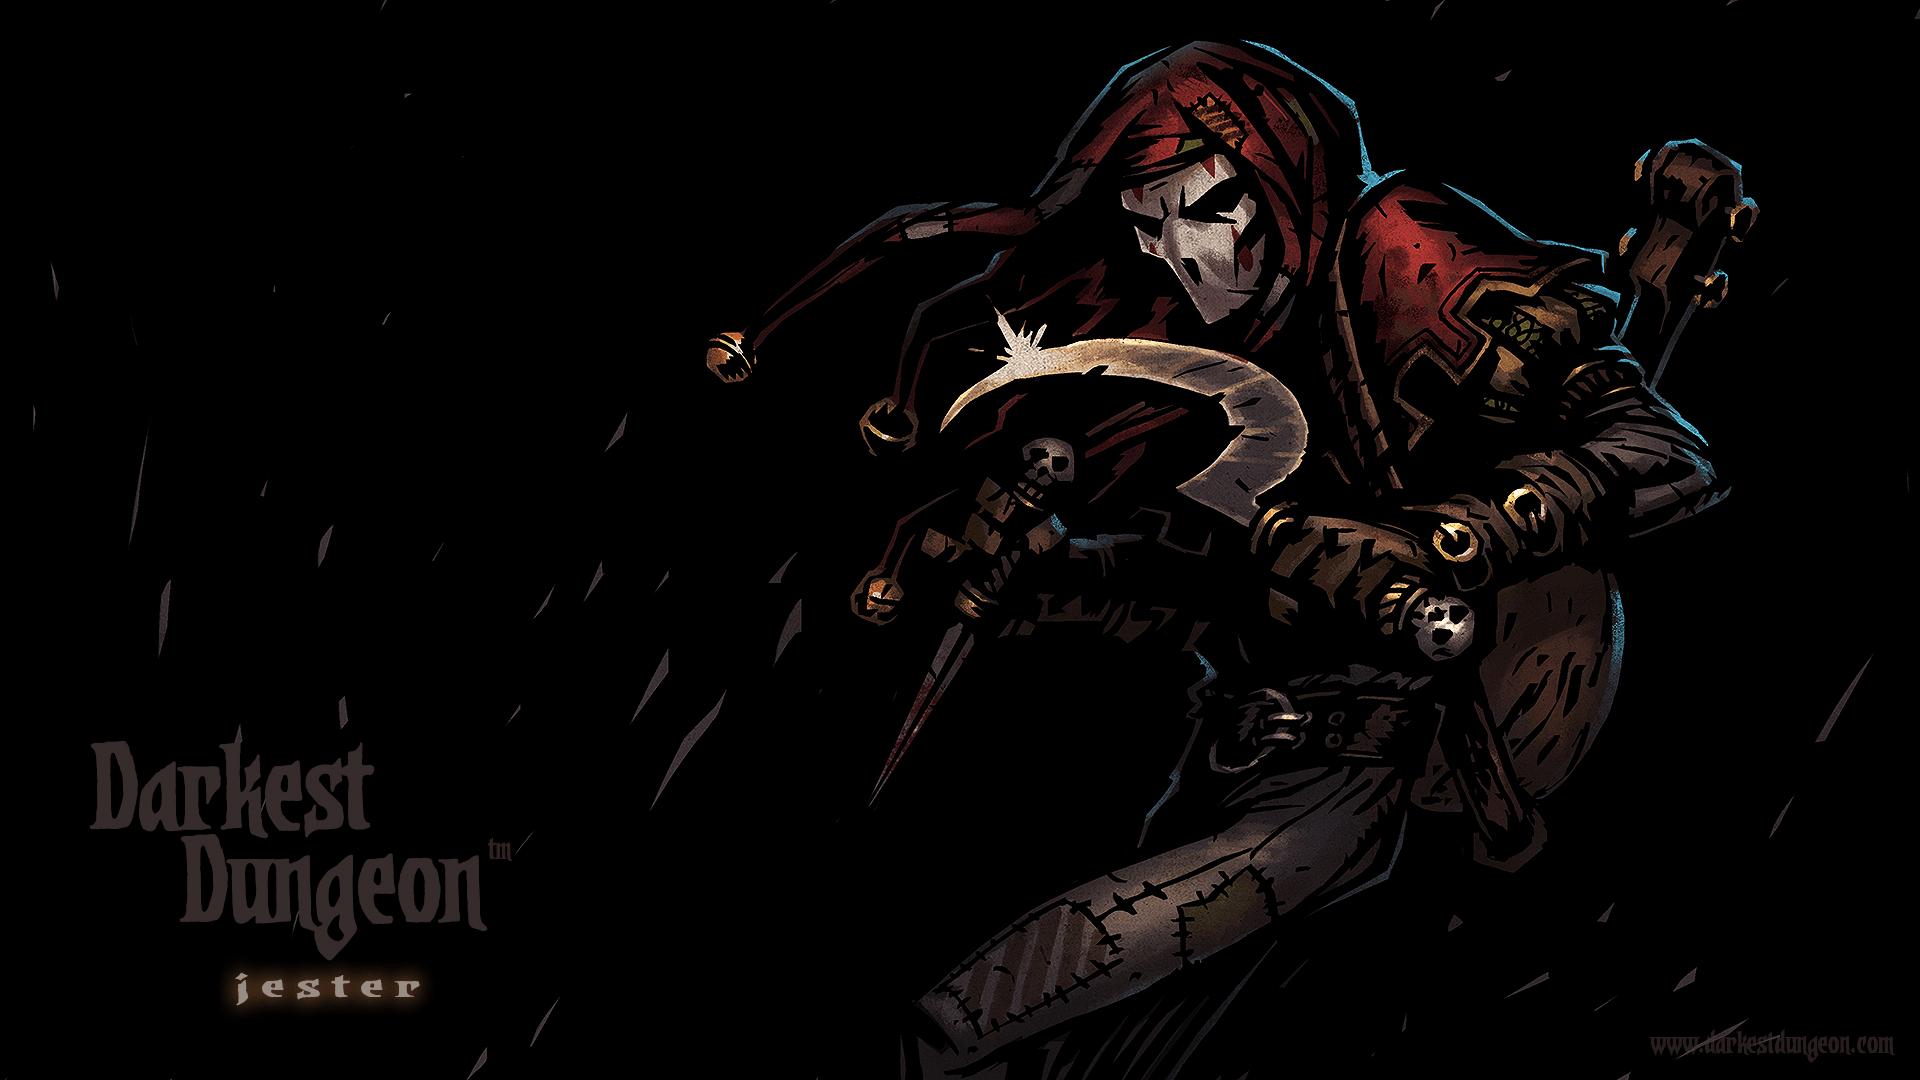 Darkest Dungeon: Jester widescreen wallpapers